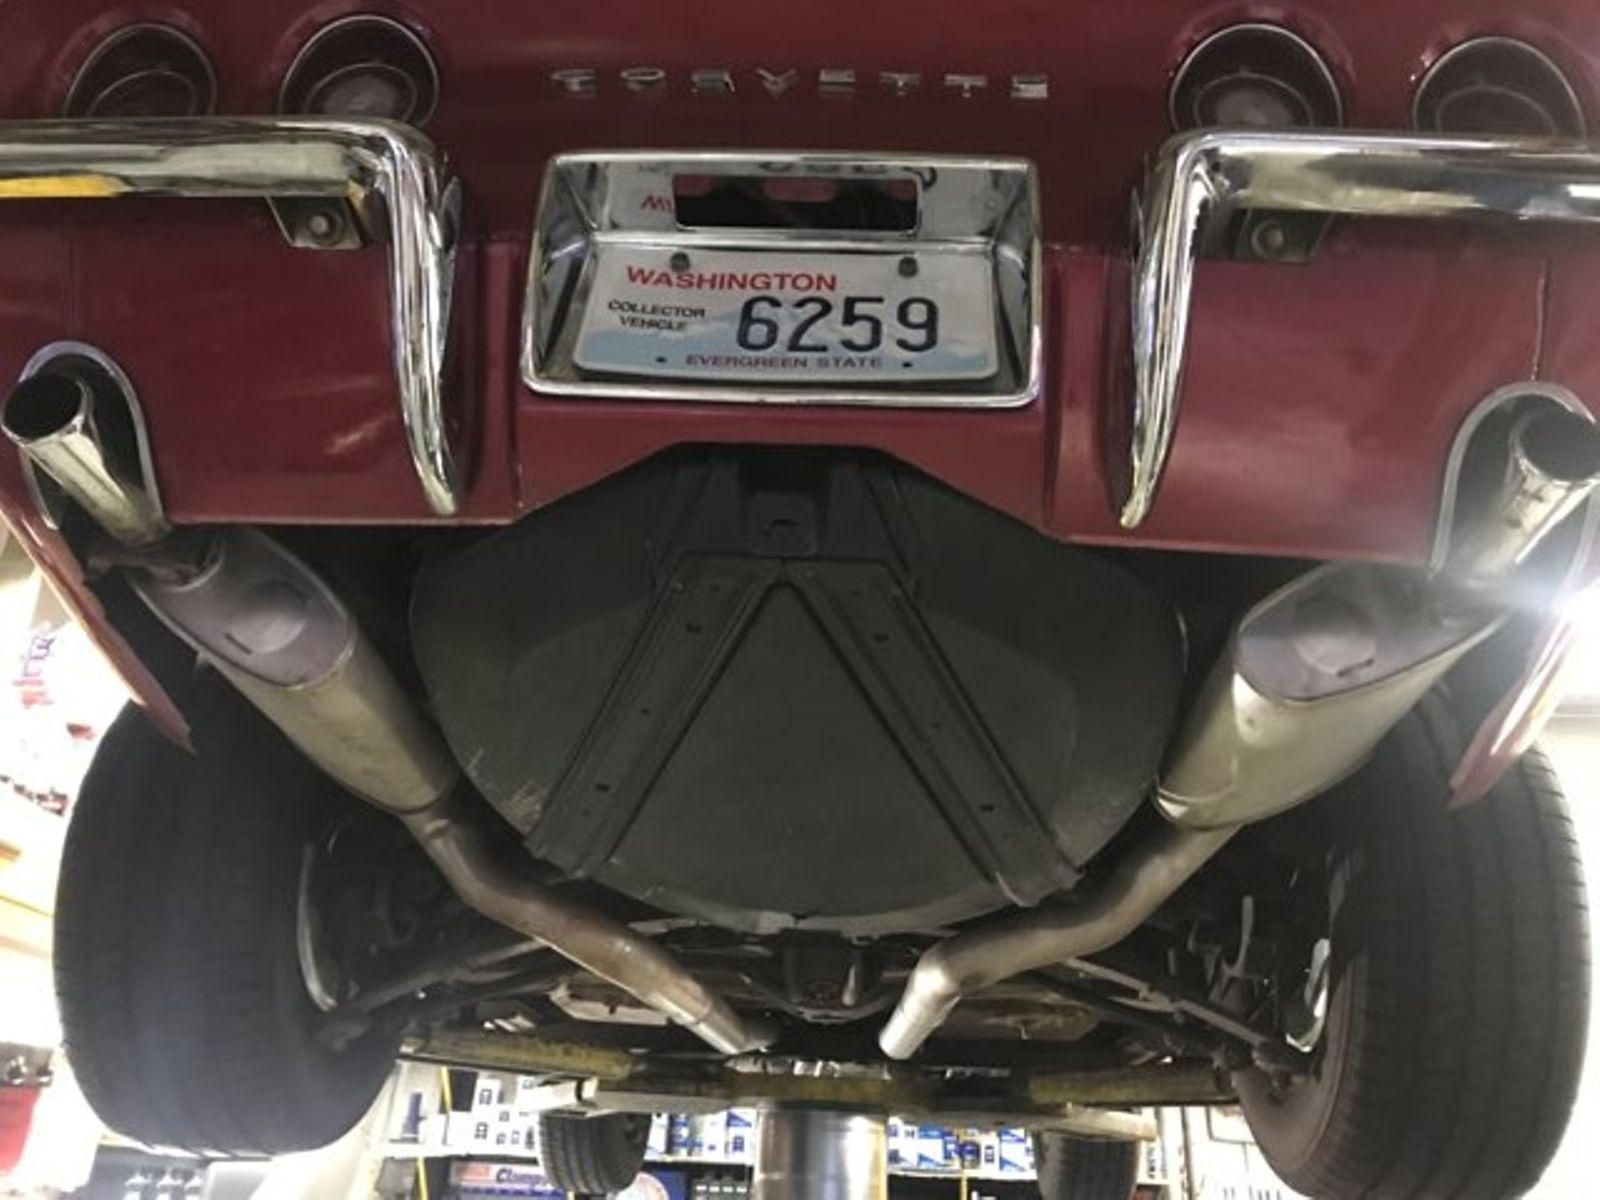 1969 Chevrolet Corvette Stingray L46 350ci 350hp 4 Speed Muncie